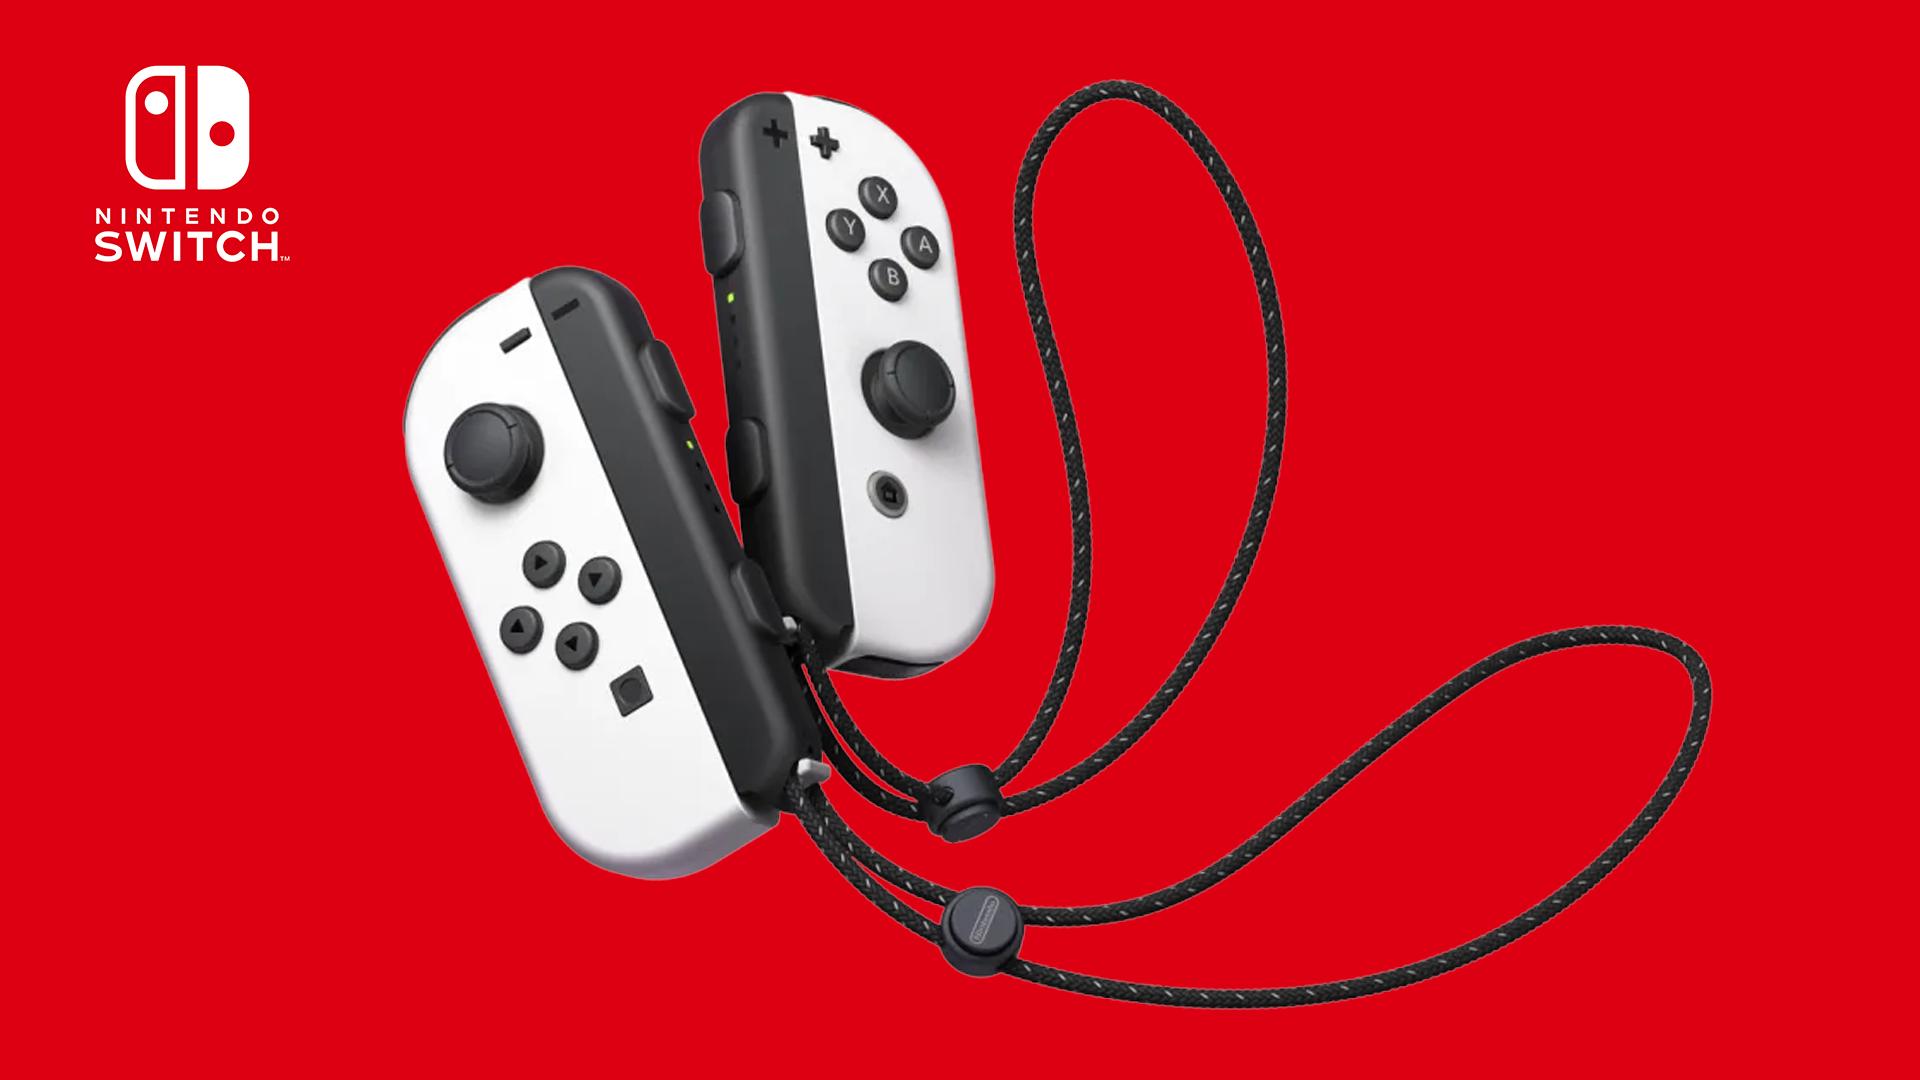 The Nintendo Switch OLED Model Joy-Cons